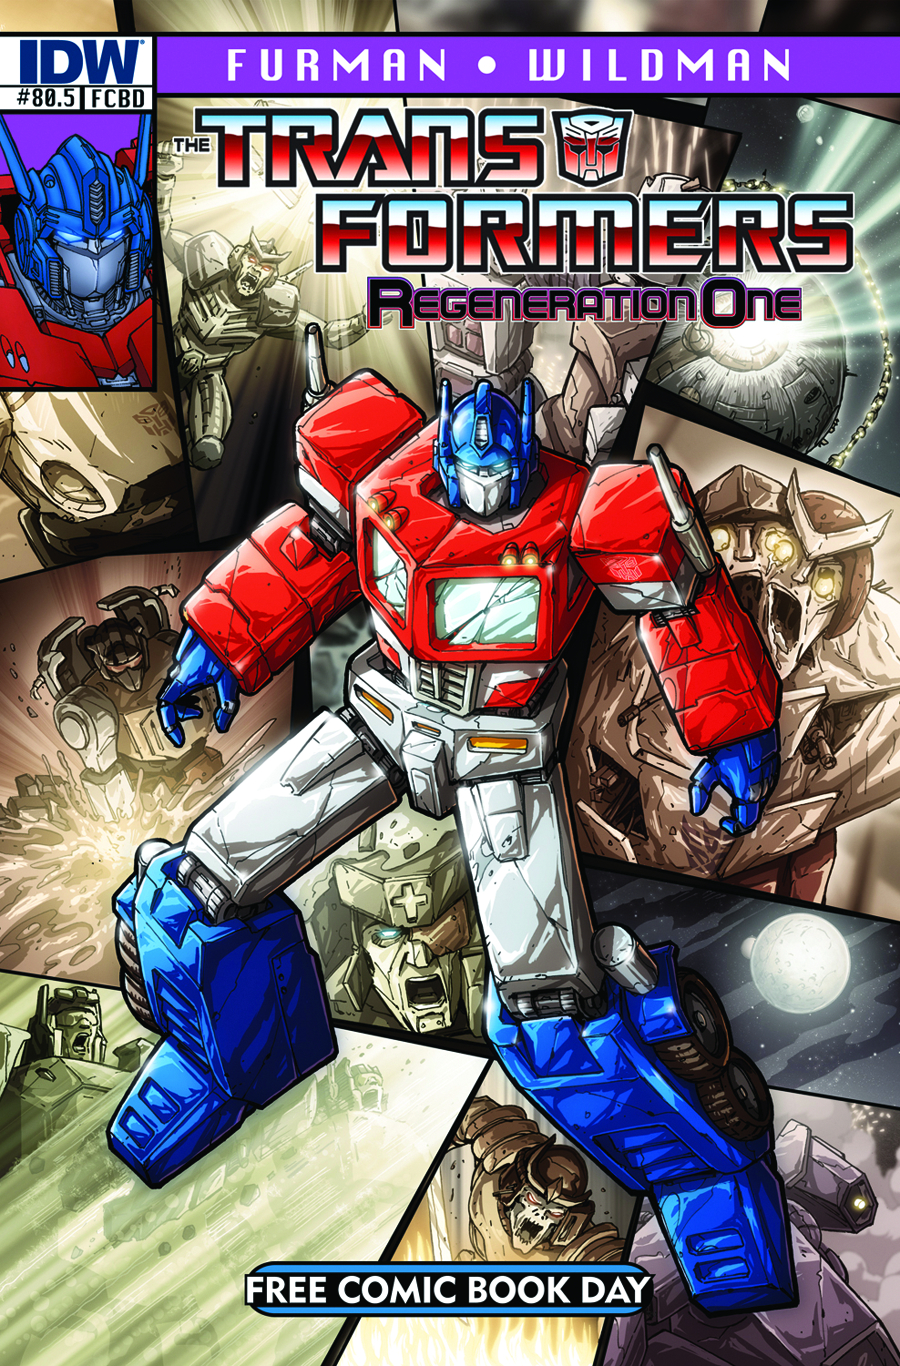 STK460612 Free Comic Book Day 2012: Reviews!